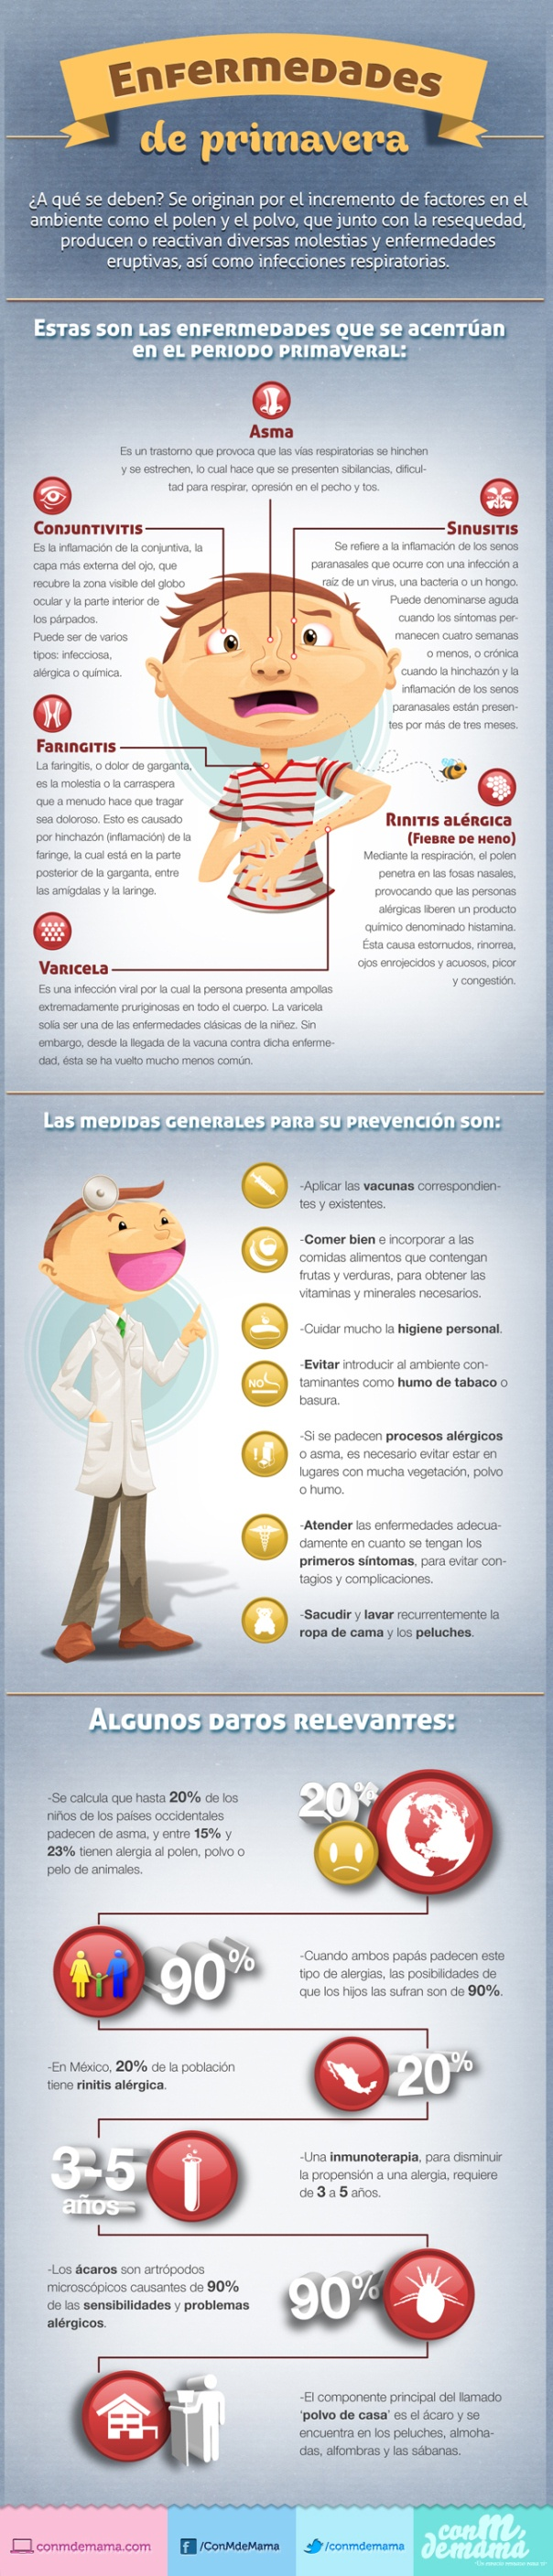 Enfermedades cardiovasculares #infografia